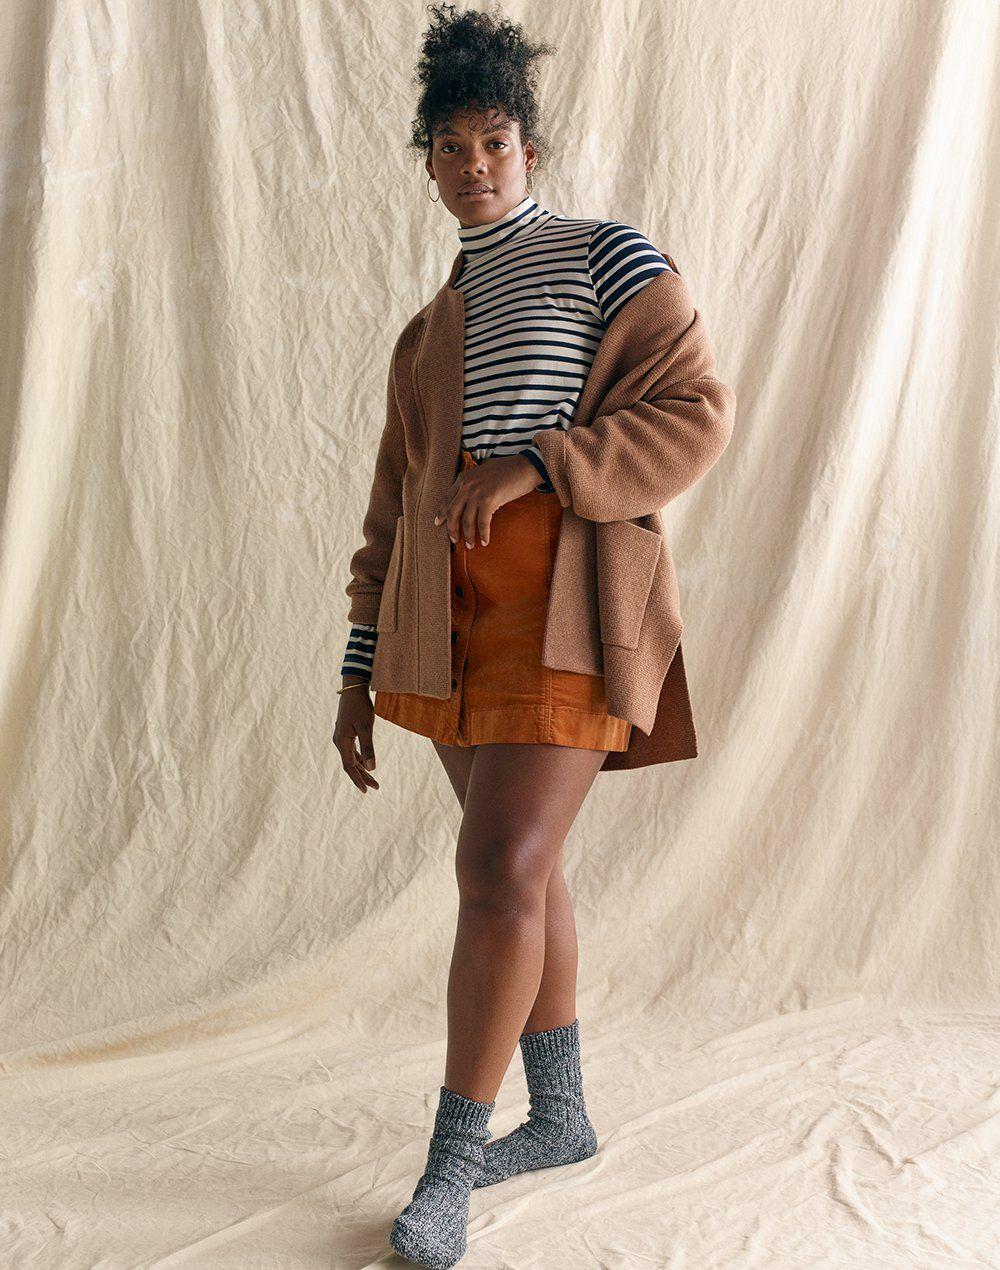 madewell spencer sweater-jacket worn with wide-sleeve turtleneck ... 3470dbbf0